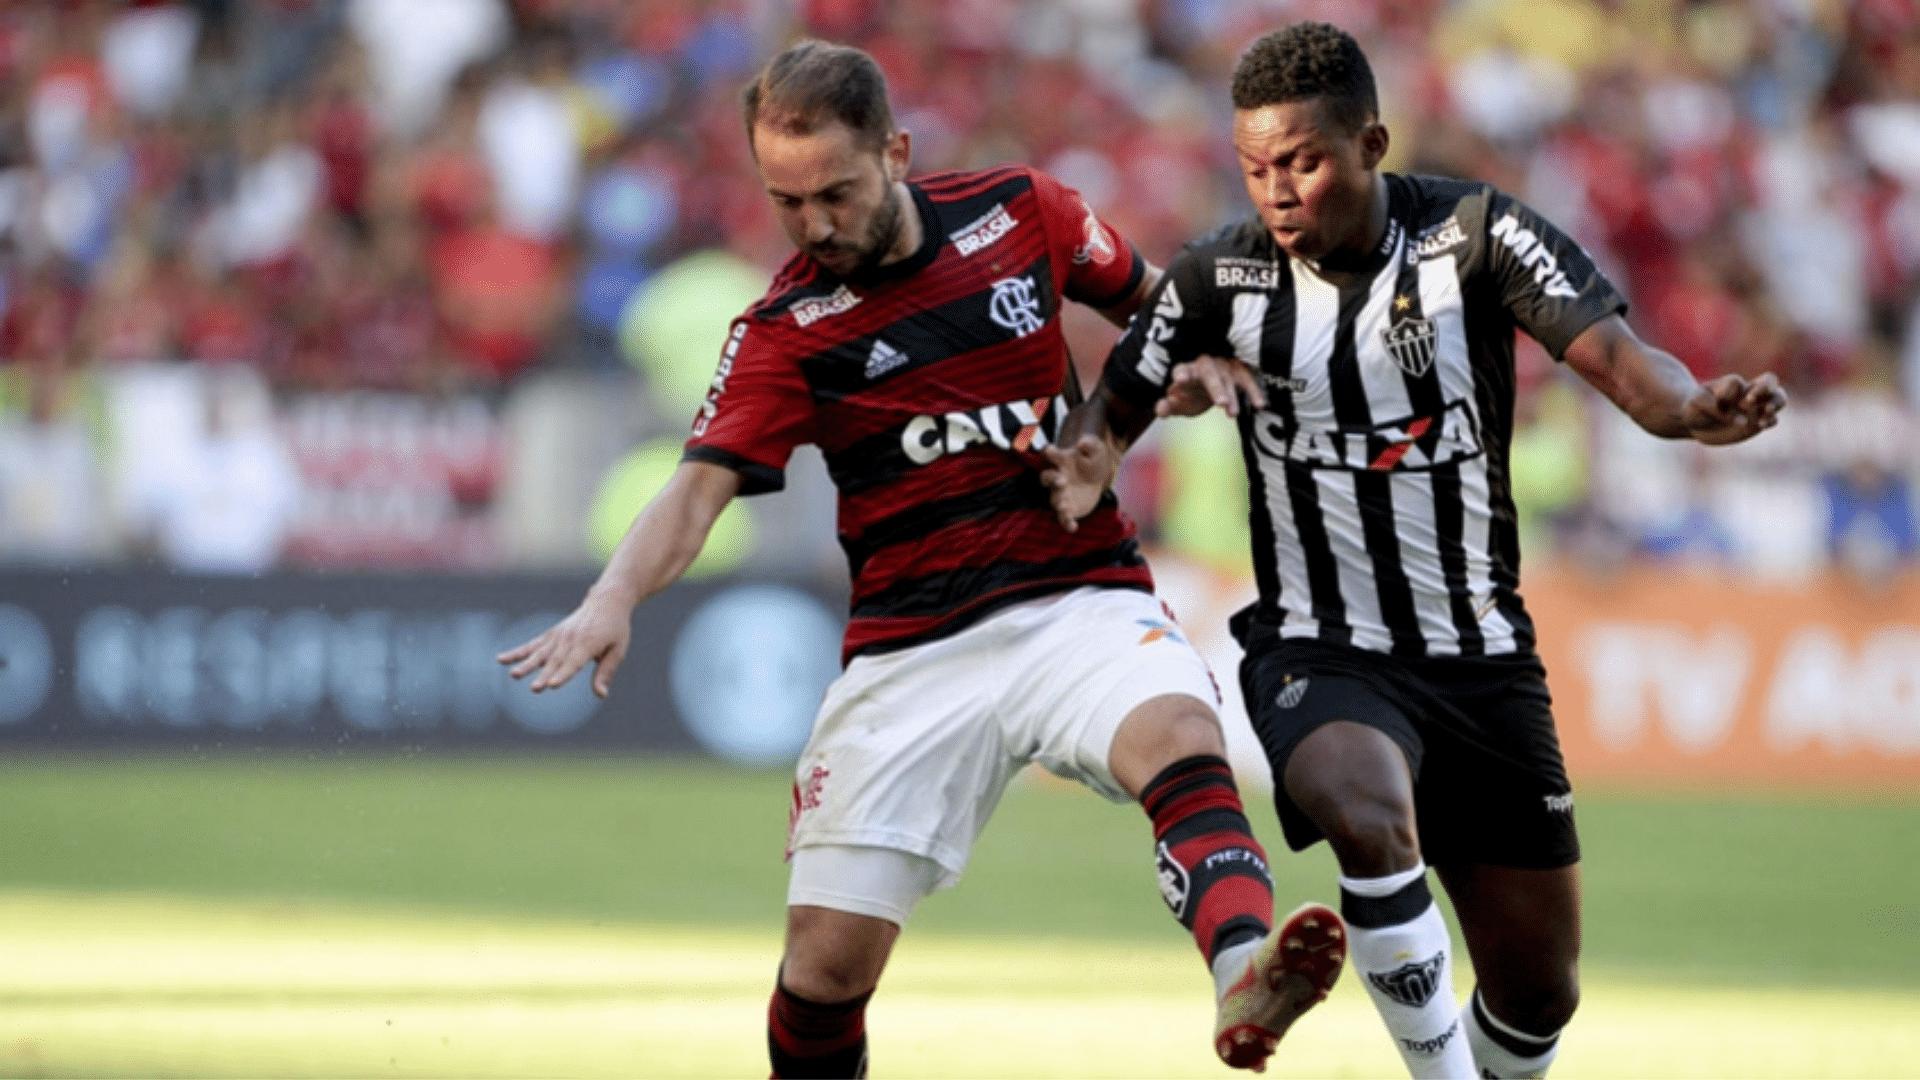 VER Vs GEN Fantasy Prediction: Verona Vs Genoa Best Fantasy Picks for Serie A 2020-21 Match